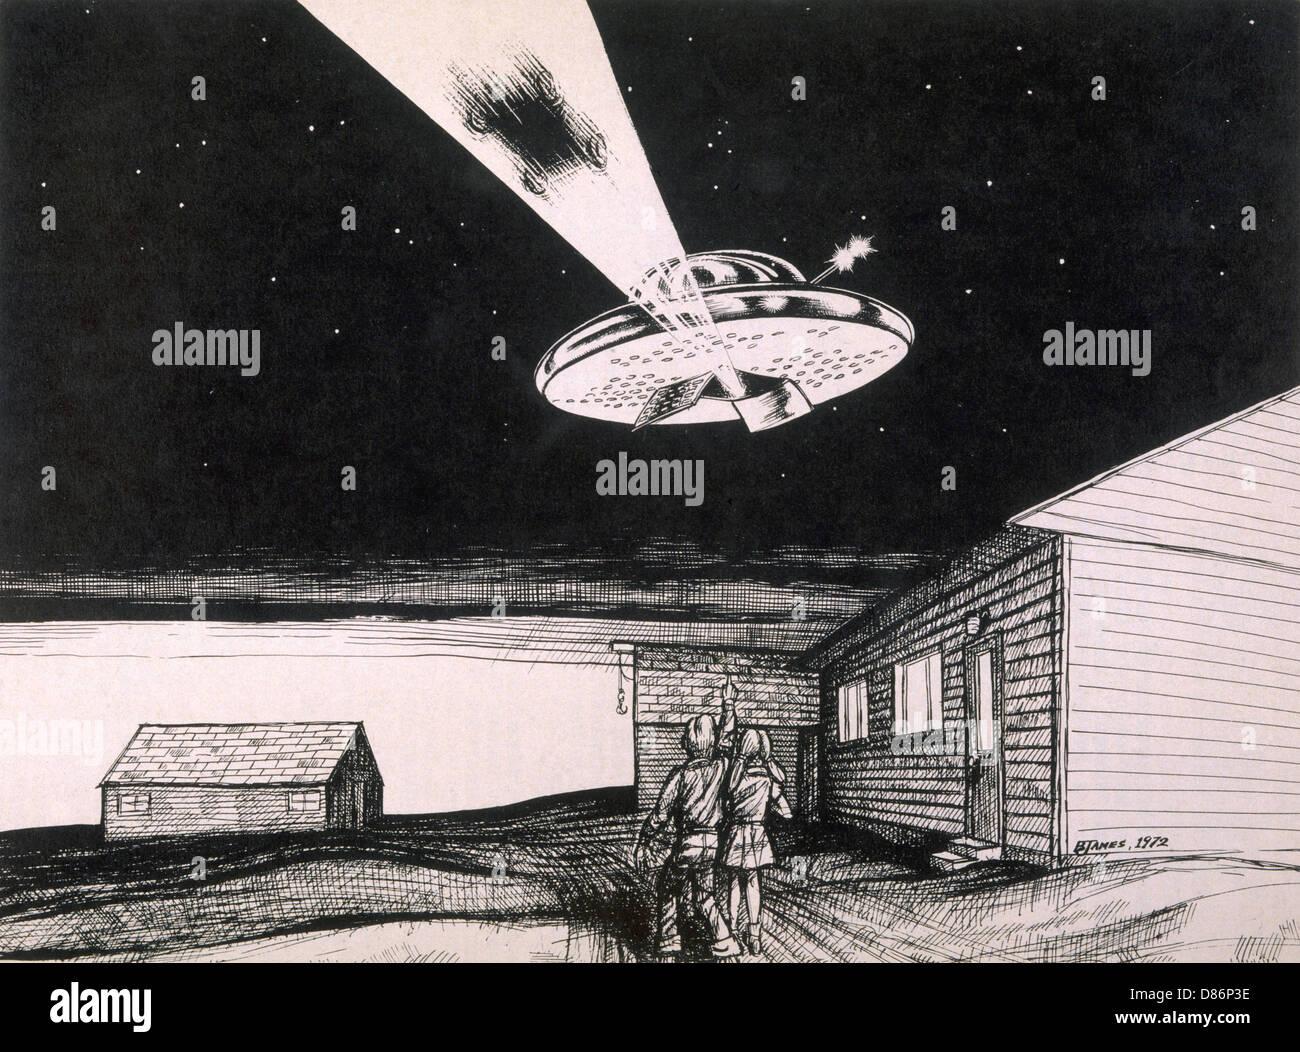 Ufo Car Abduction - Stock Image